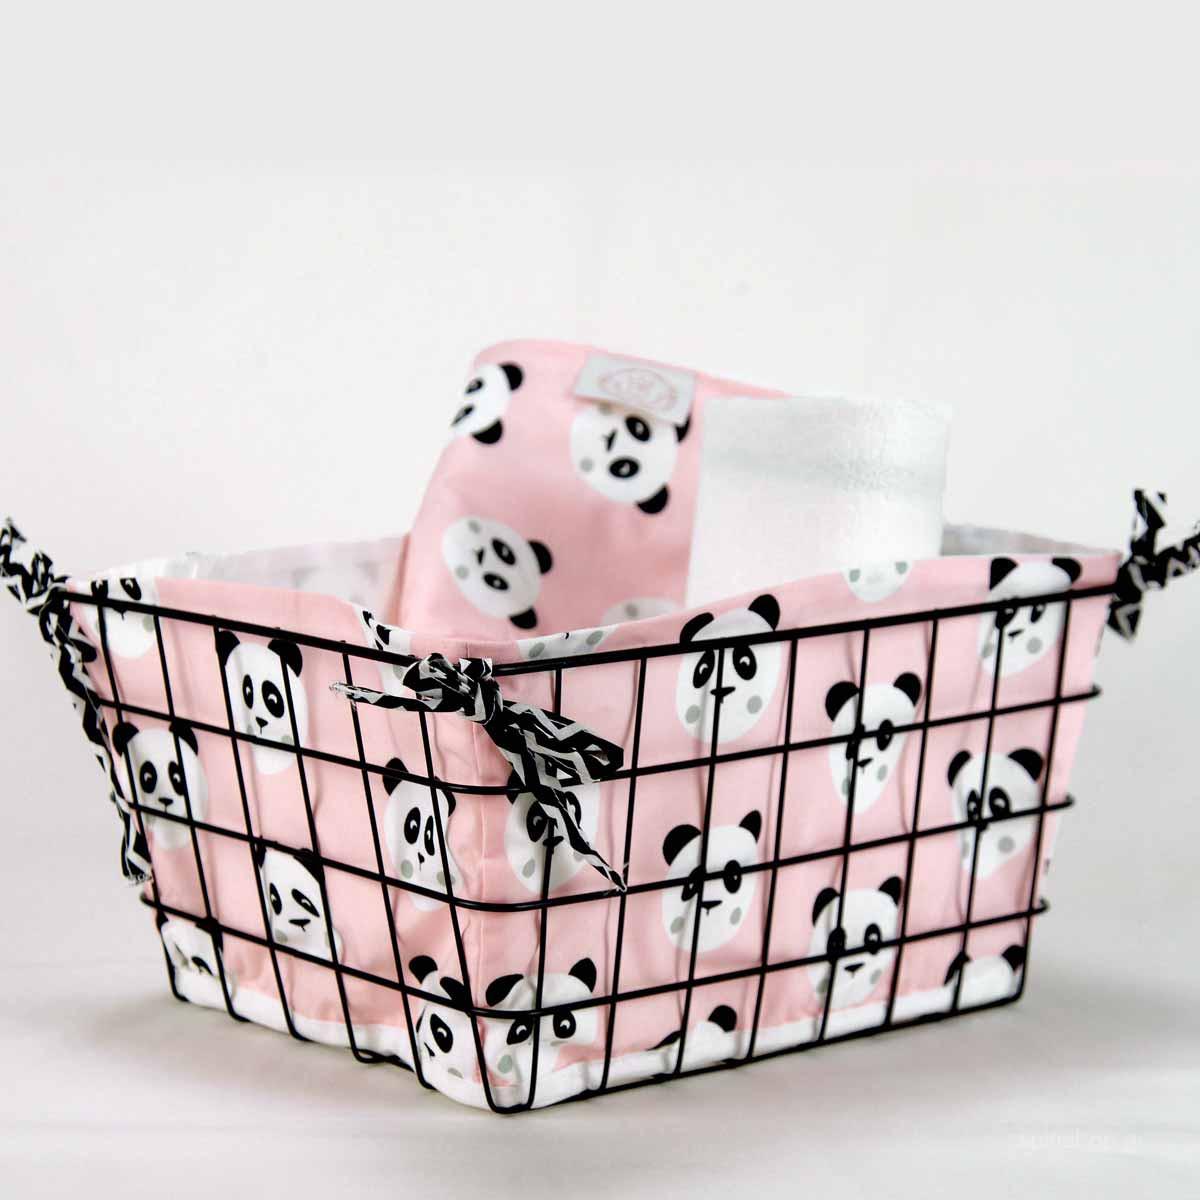 b690c9db81c -10% Spiti Shop Καλαθάκι Καλλυντικών Ninna Nanna Pink Panda